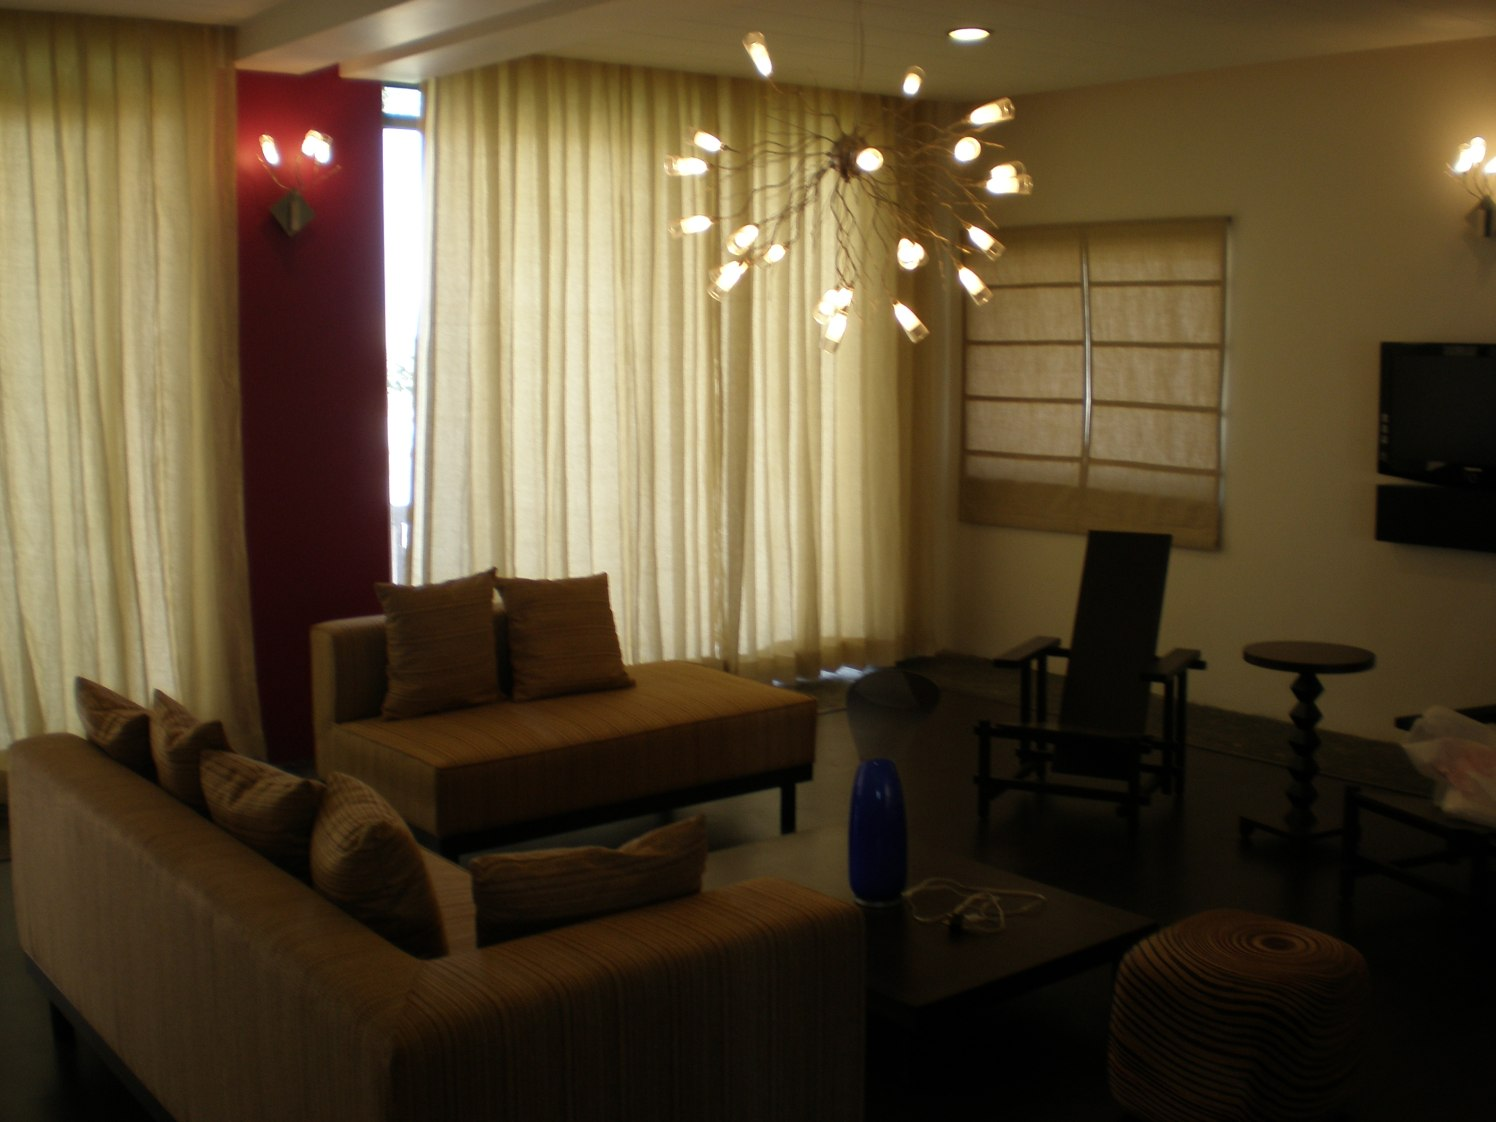 A Sparkling Room by Rohit Gir Modern | Interior Design Photos & Ideas